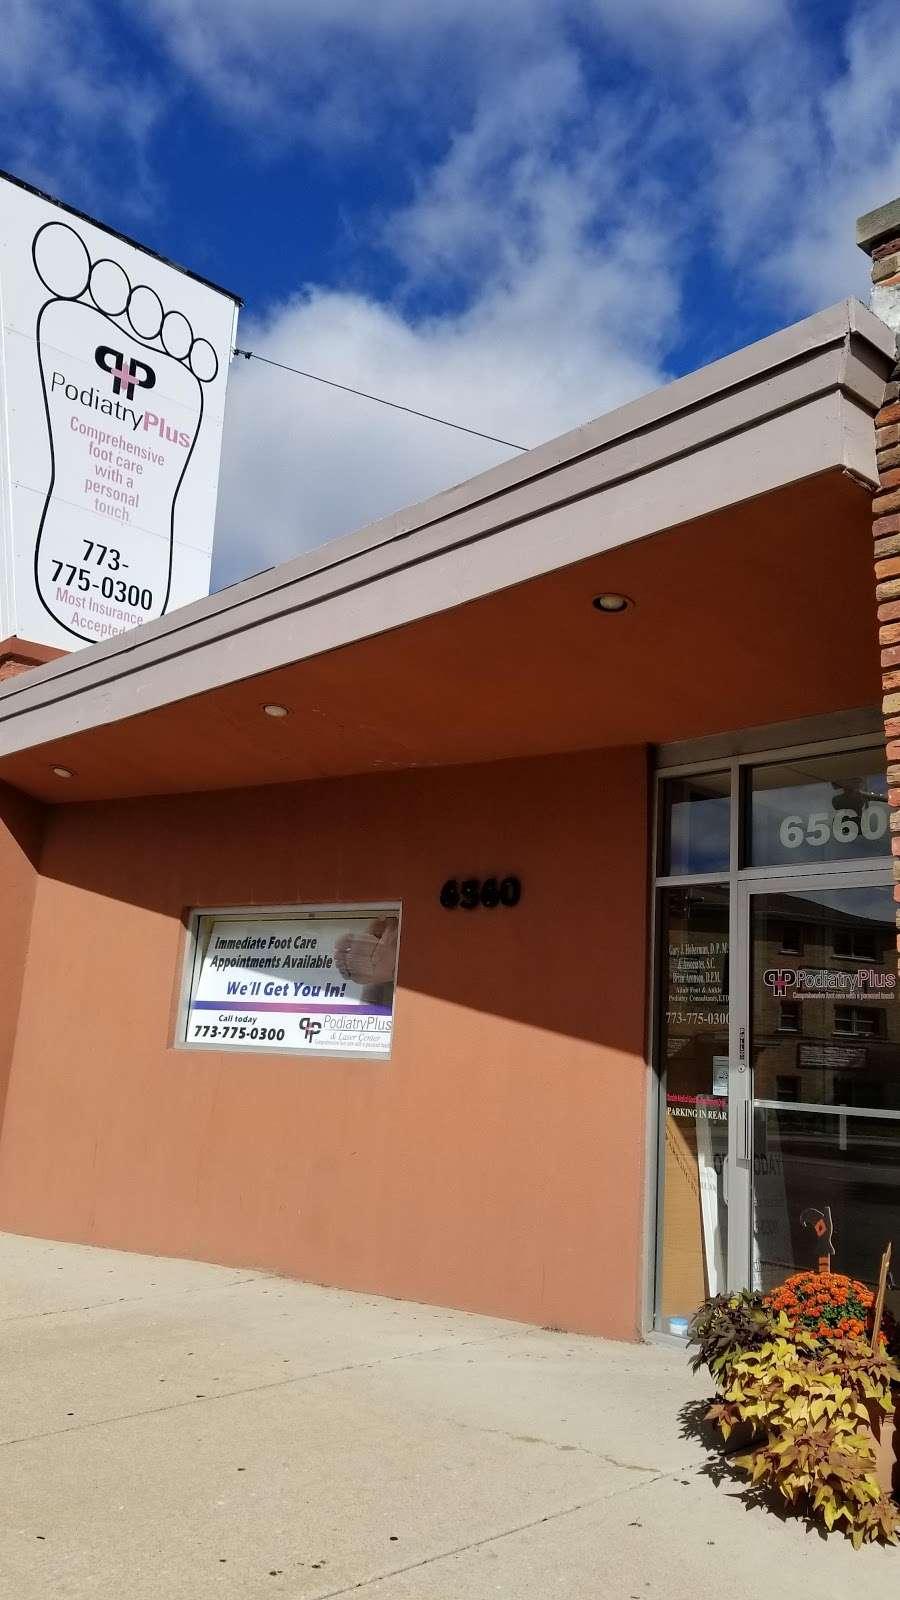 Podiatry Plus - shoe store  | Photo 7 of 10 | Address: 6560 W Higgins Ave, Chicago, IL 60656, USA | Phone: (773) 775-0300